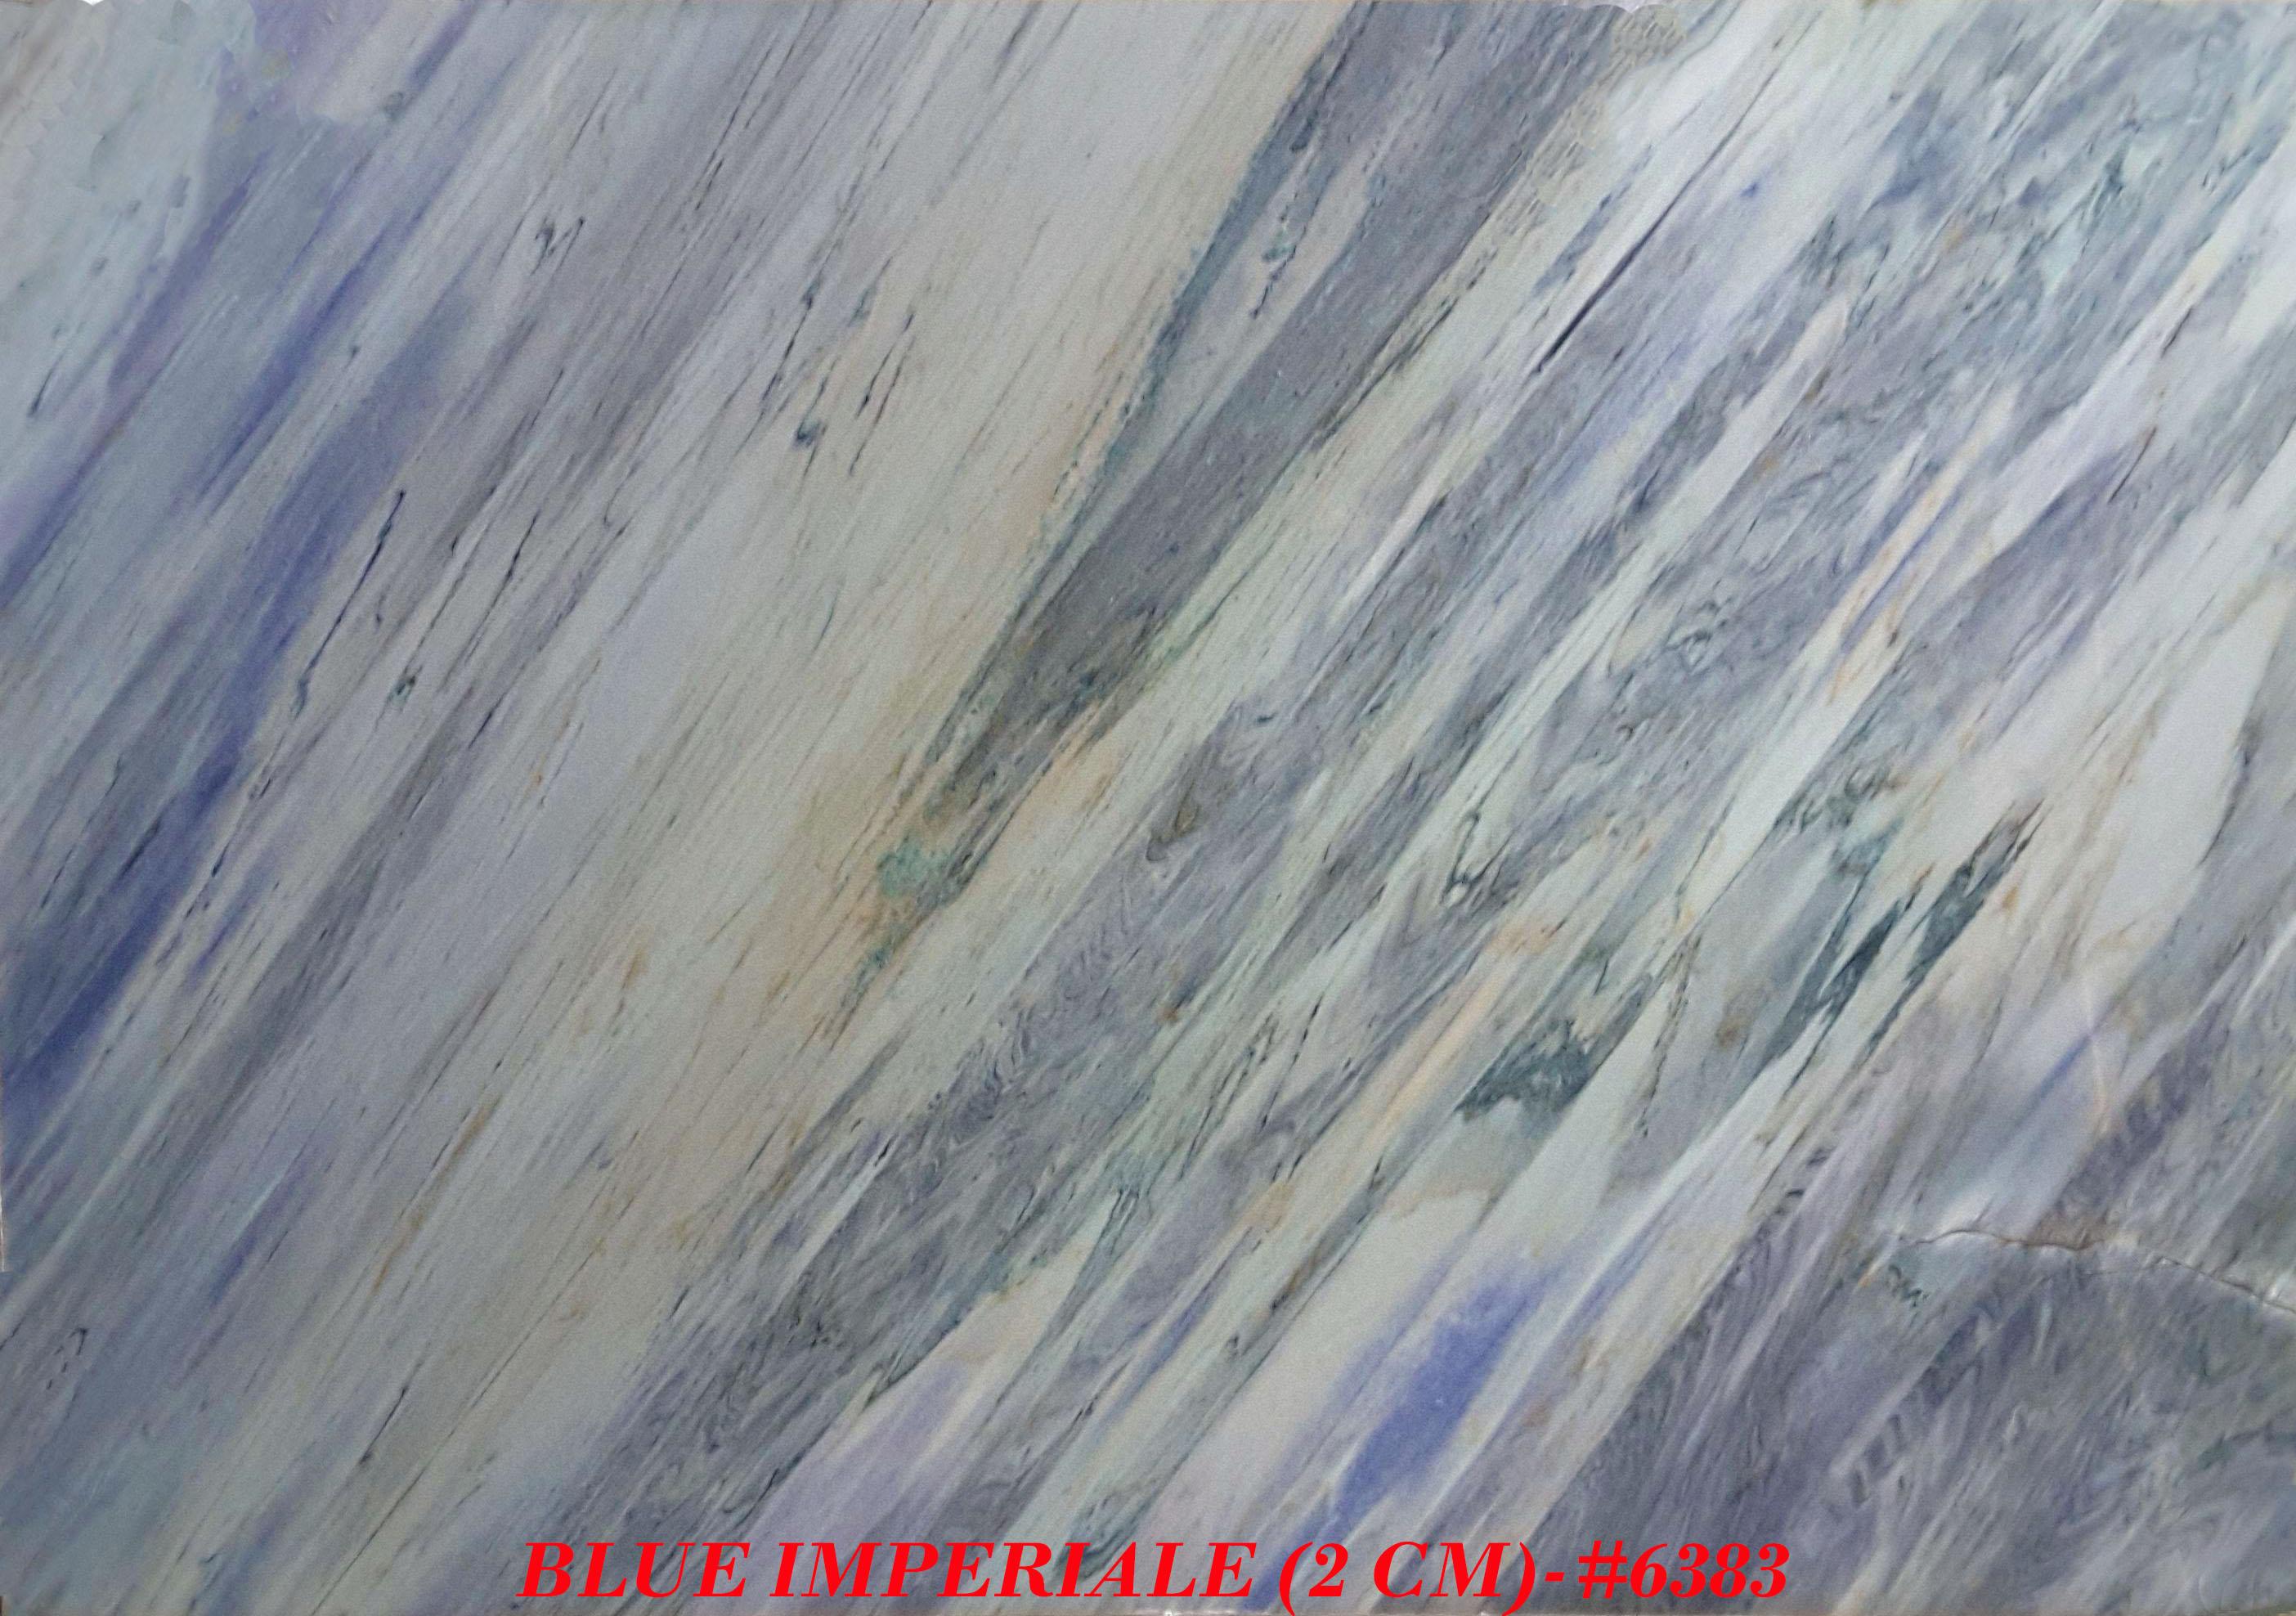 BLUE IMPERIALE (2 CM)-#6383